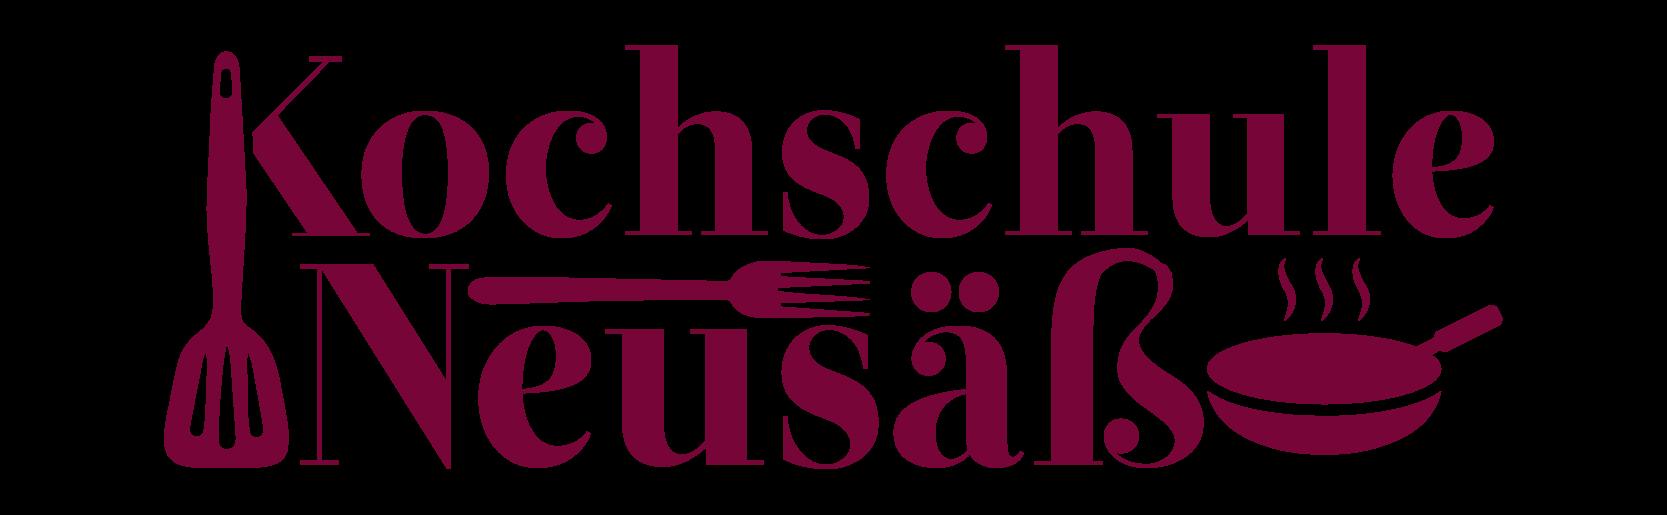 Kochschule und Events Neusäß